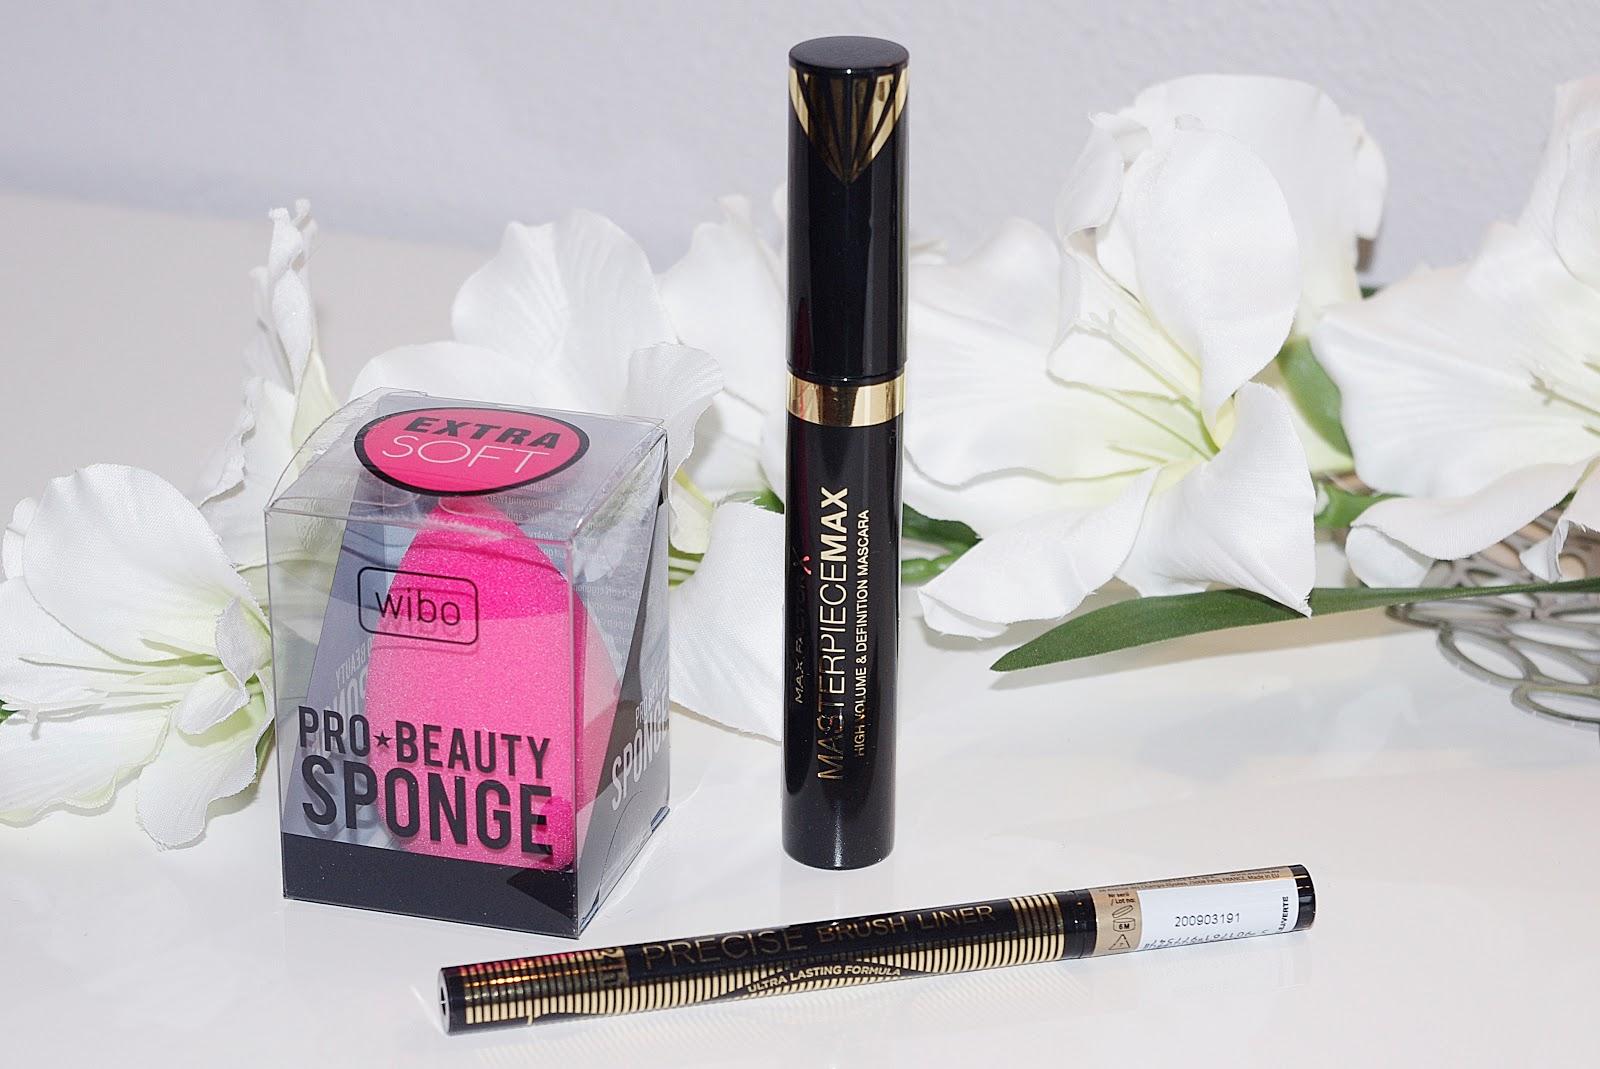 nowości wibo pro beauty sponge eyeiner eveline precise brush liner max factor masterpiece